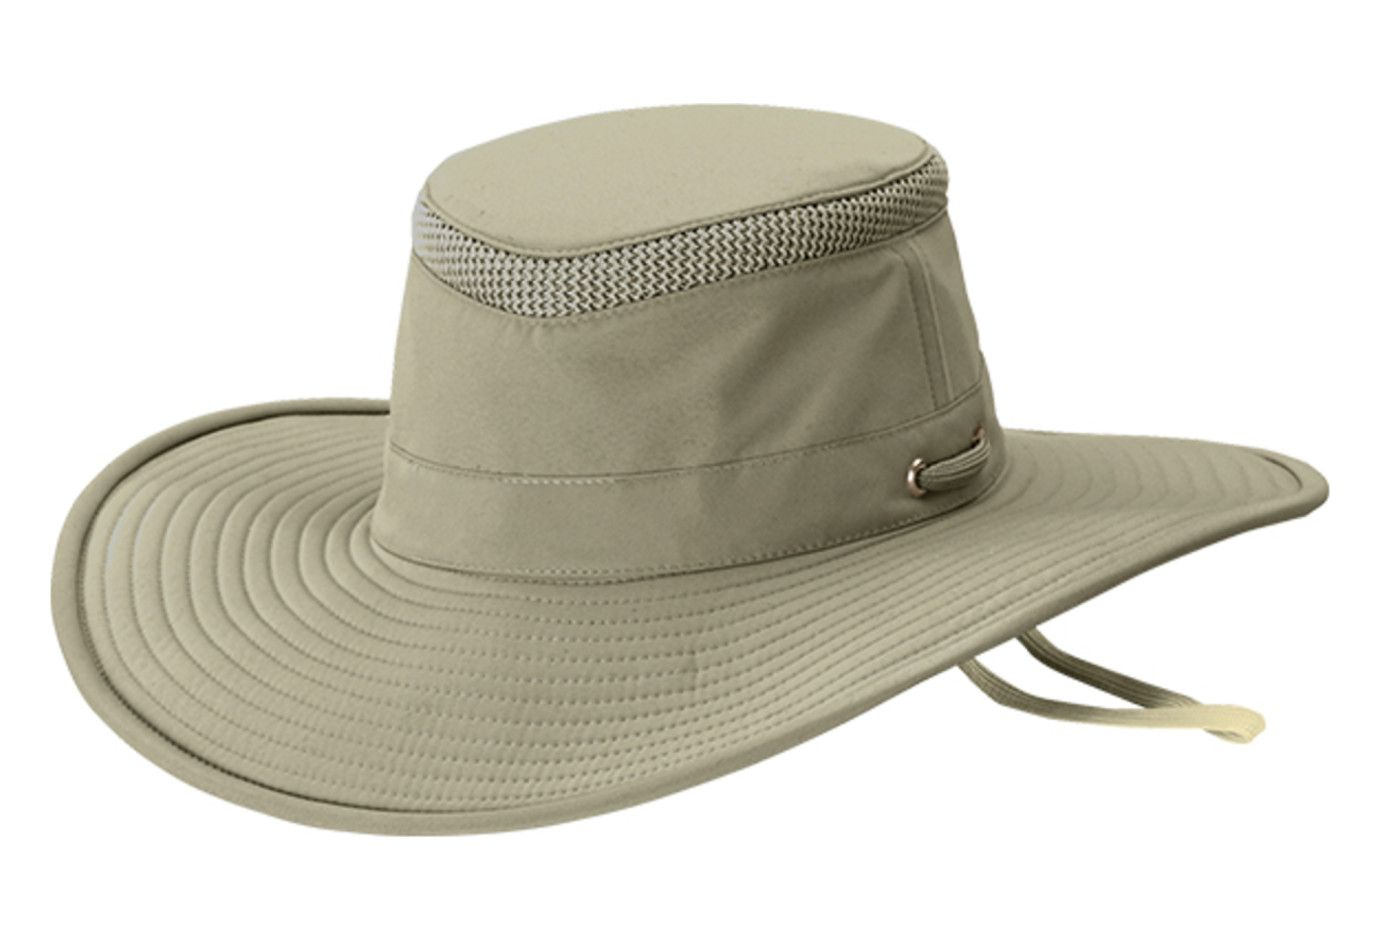 Tilley LTM2 Broadest Brim Lightweight Airflo Hat Khaki   Olive - size 7 1 2 22dcc1fd341